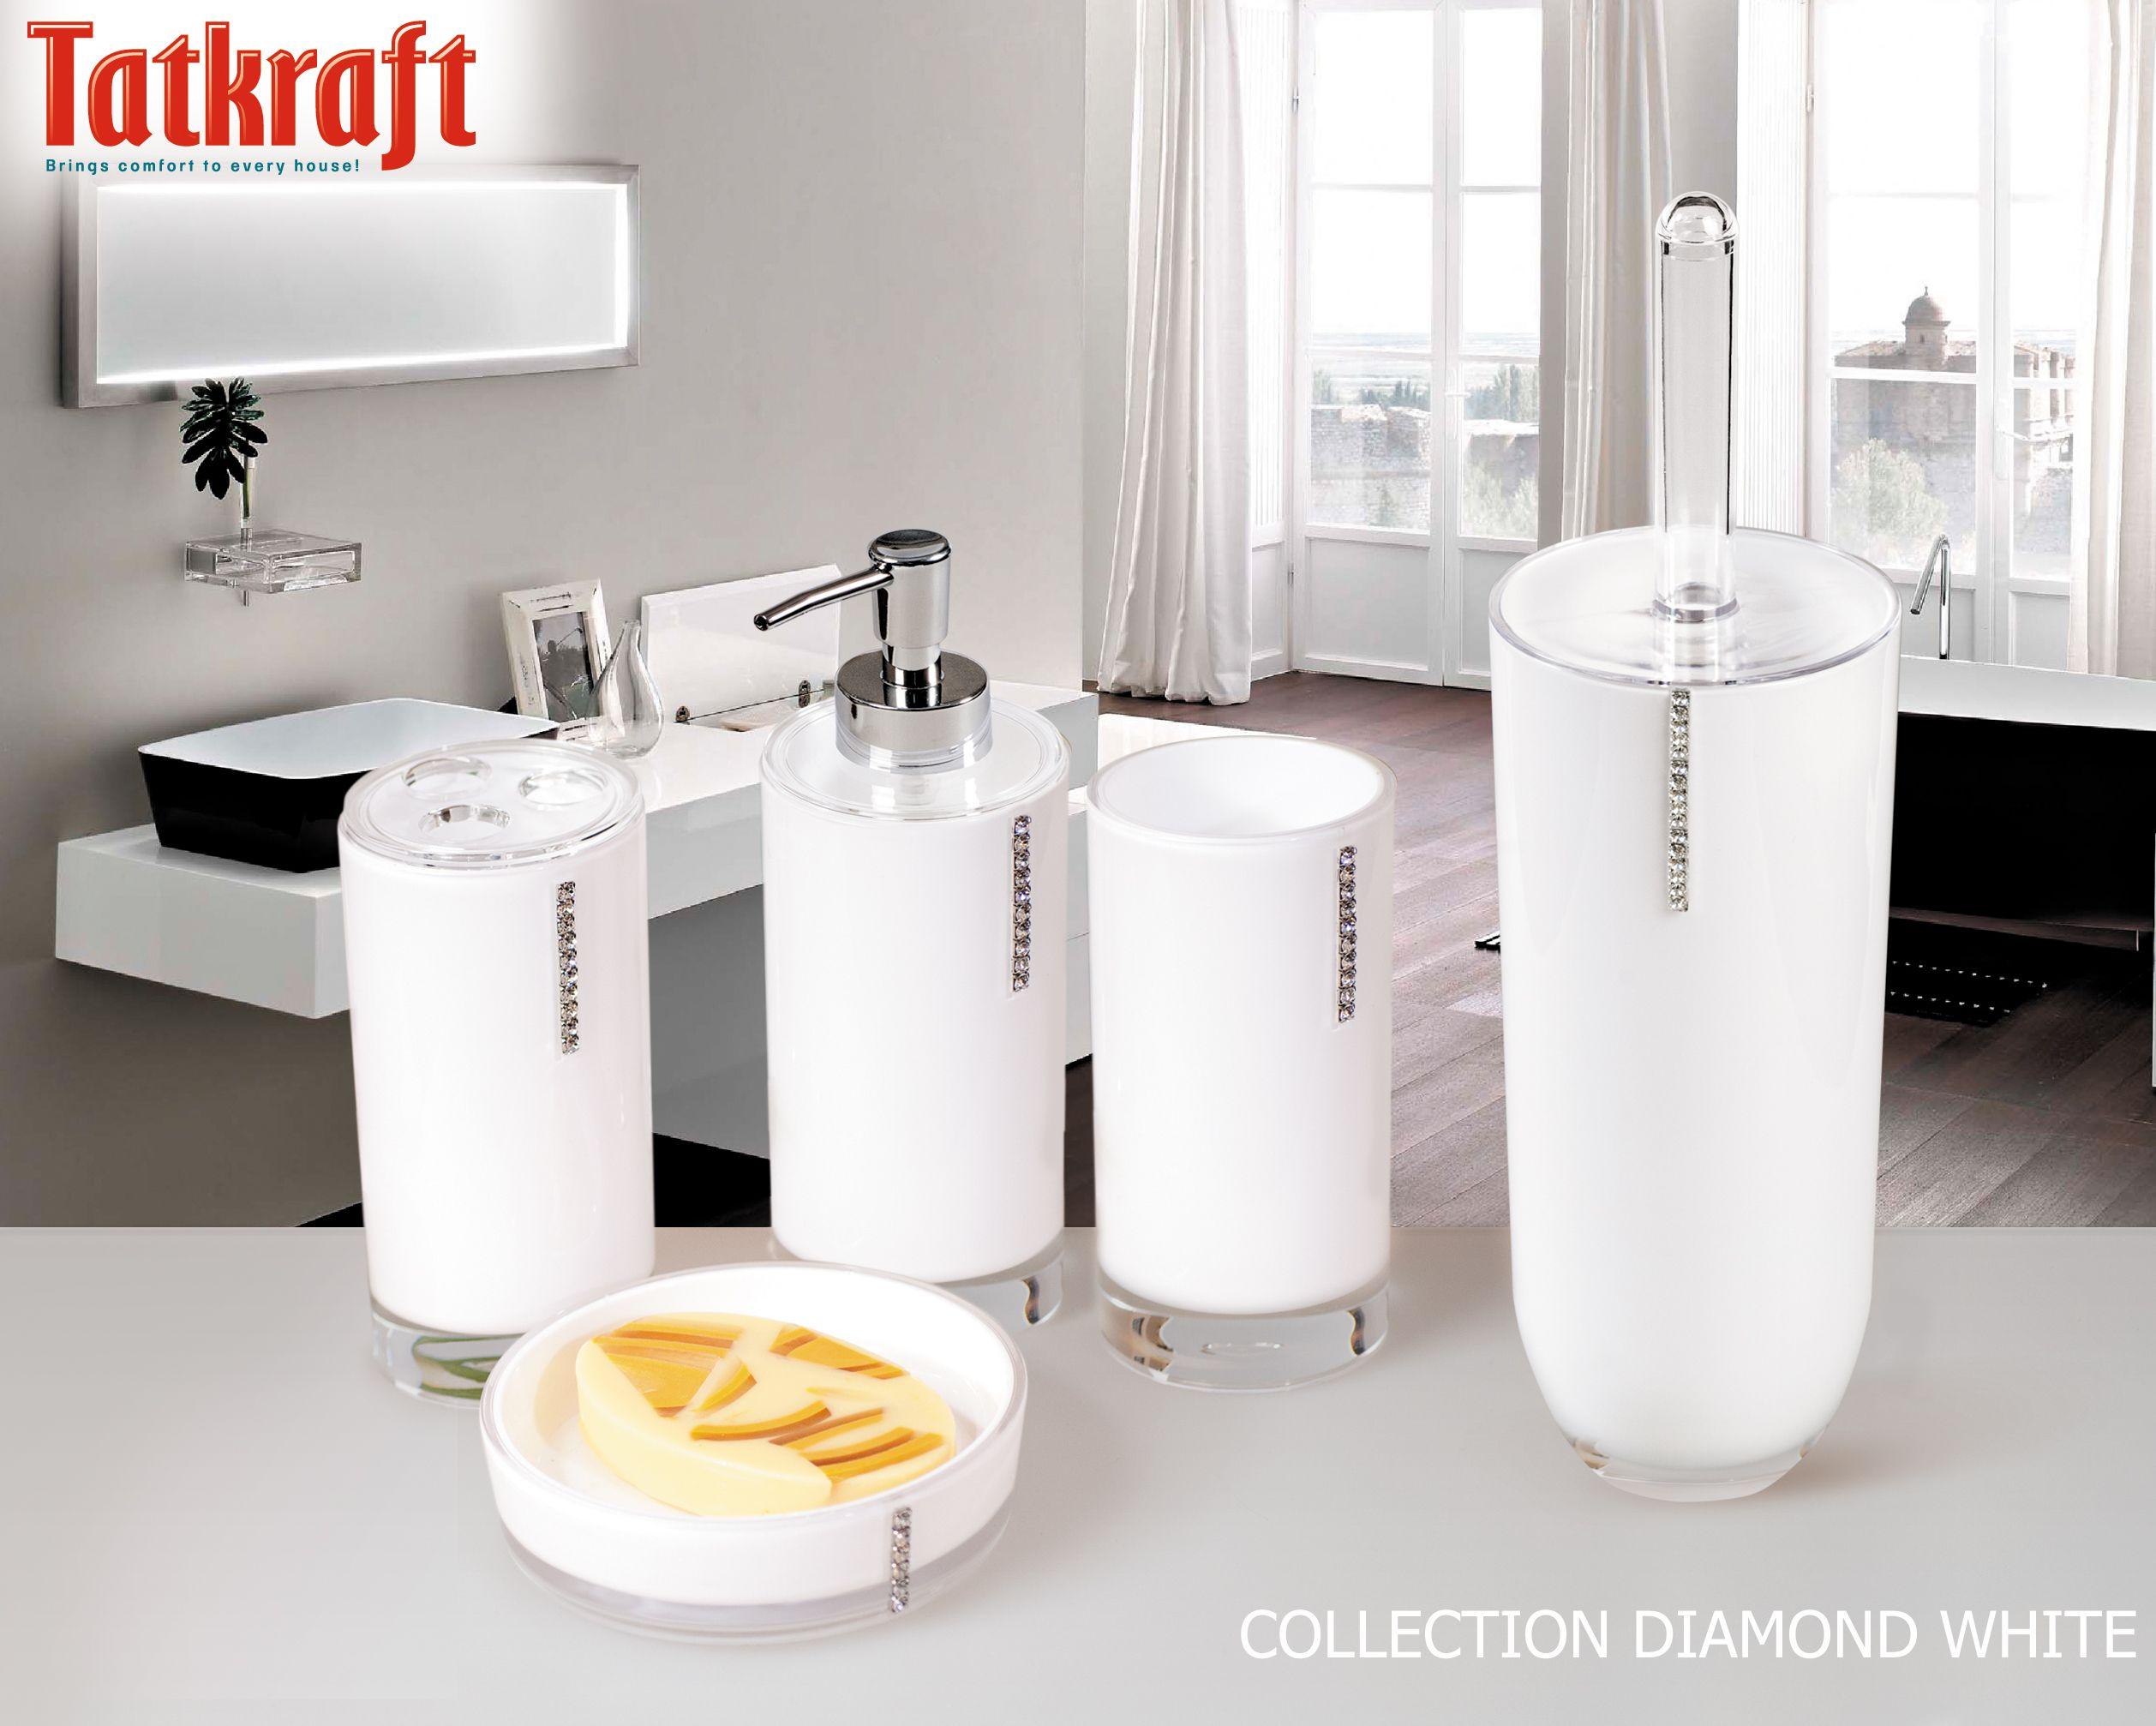 collection diamond white from tatkraft amazon uk acrylic bathroom accessories wwwtatkraft - Bathroom Accessories Uk